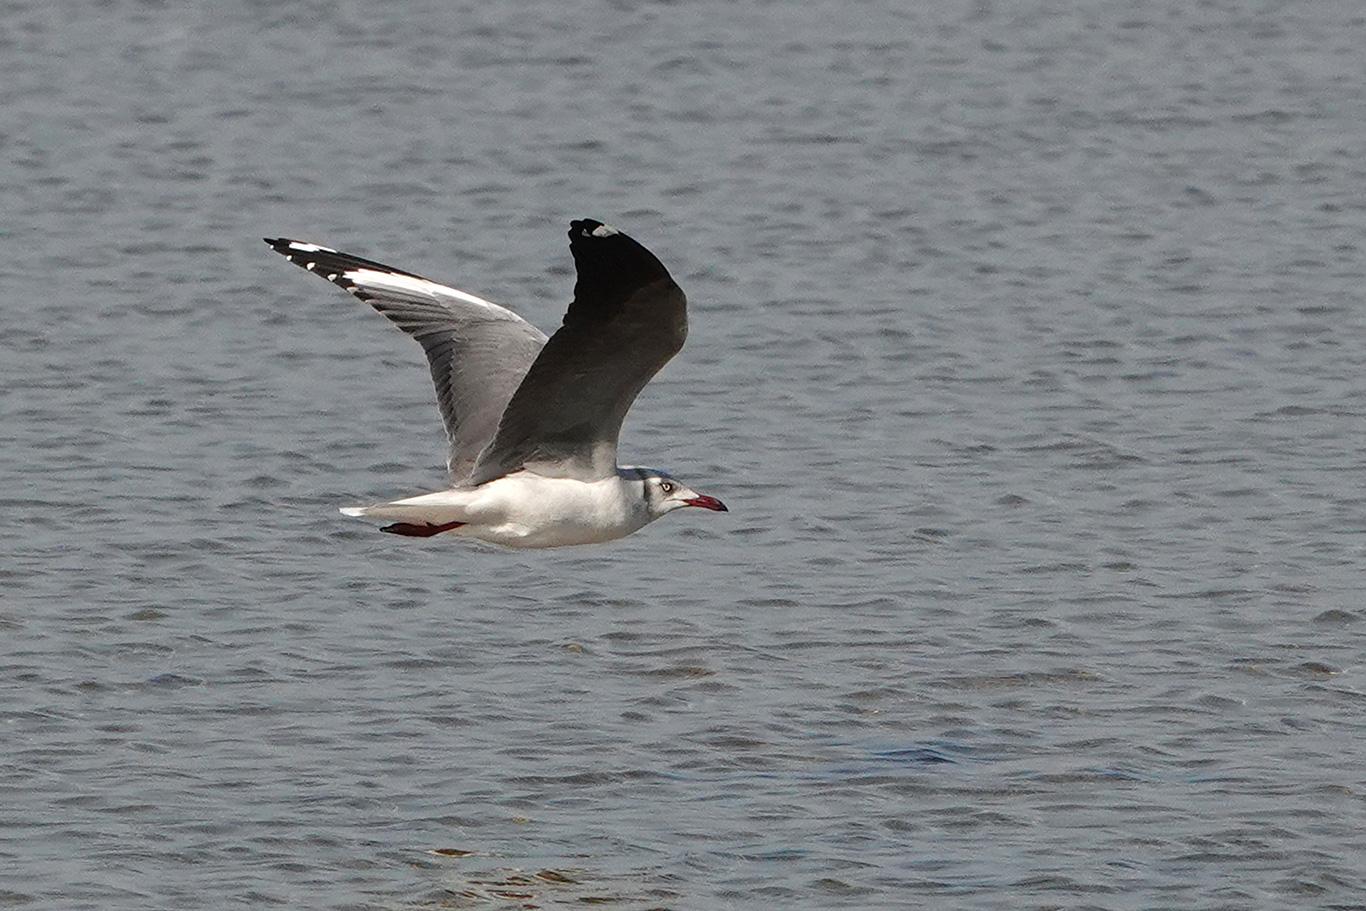 Grey-headed Gull, Pirang, The Gambia.